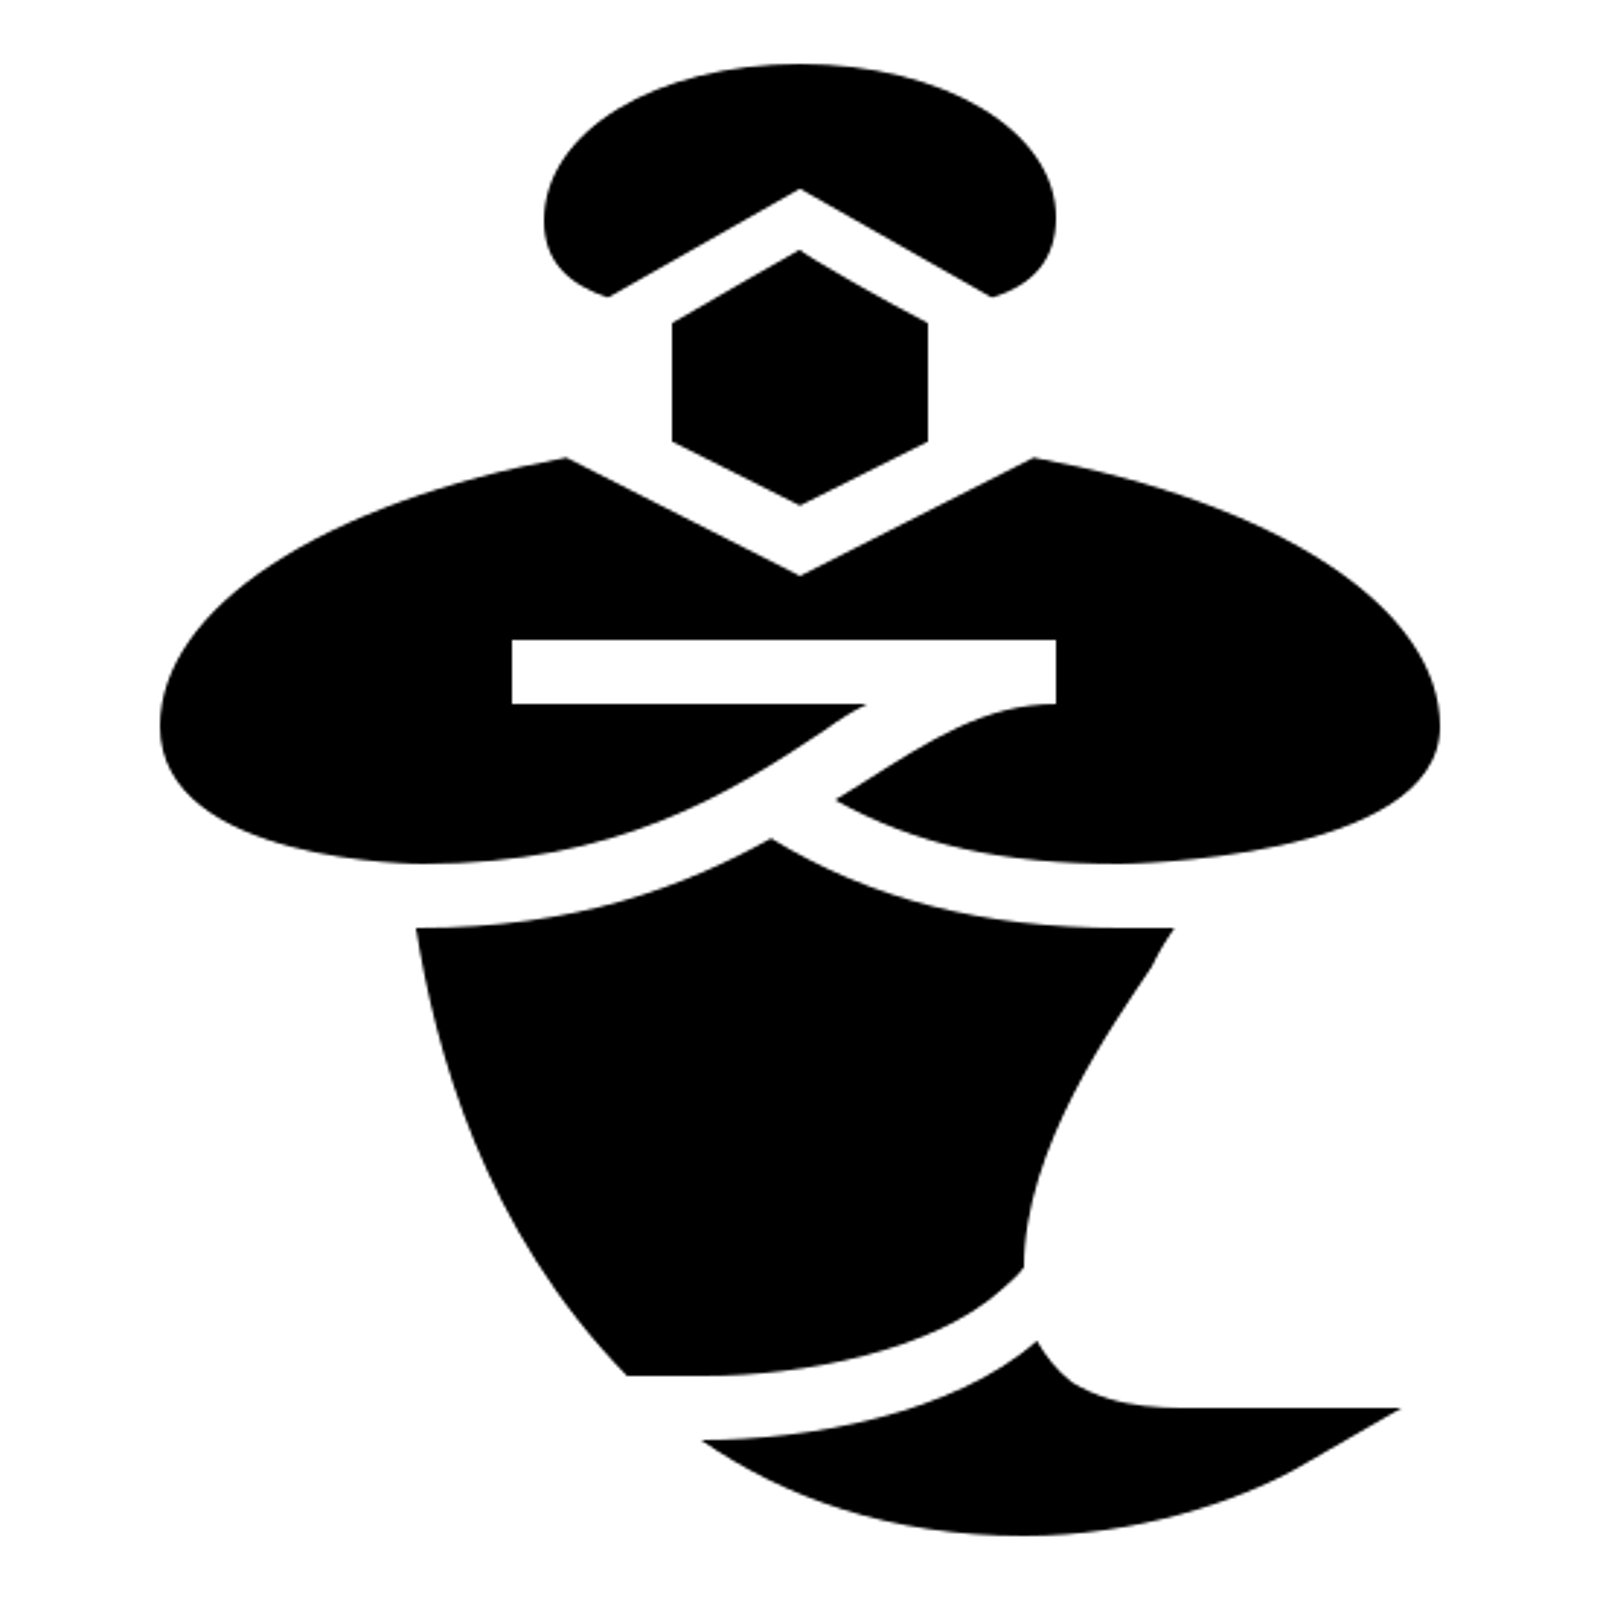 Genie Filled icon